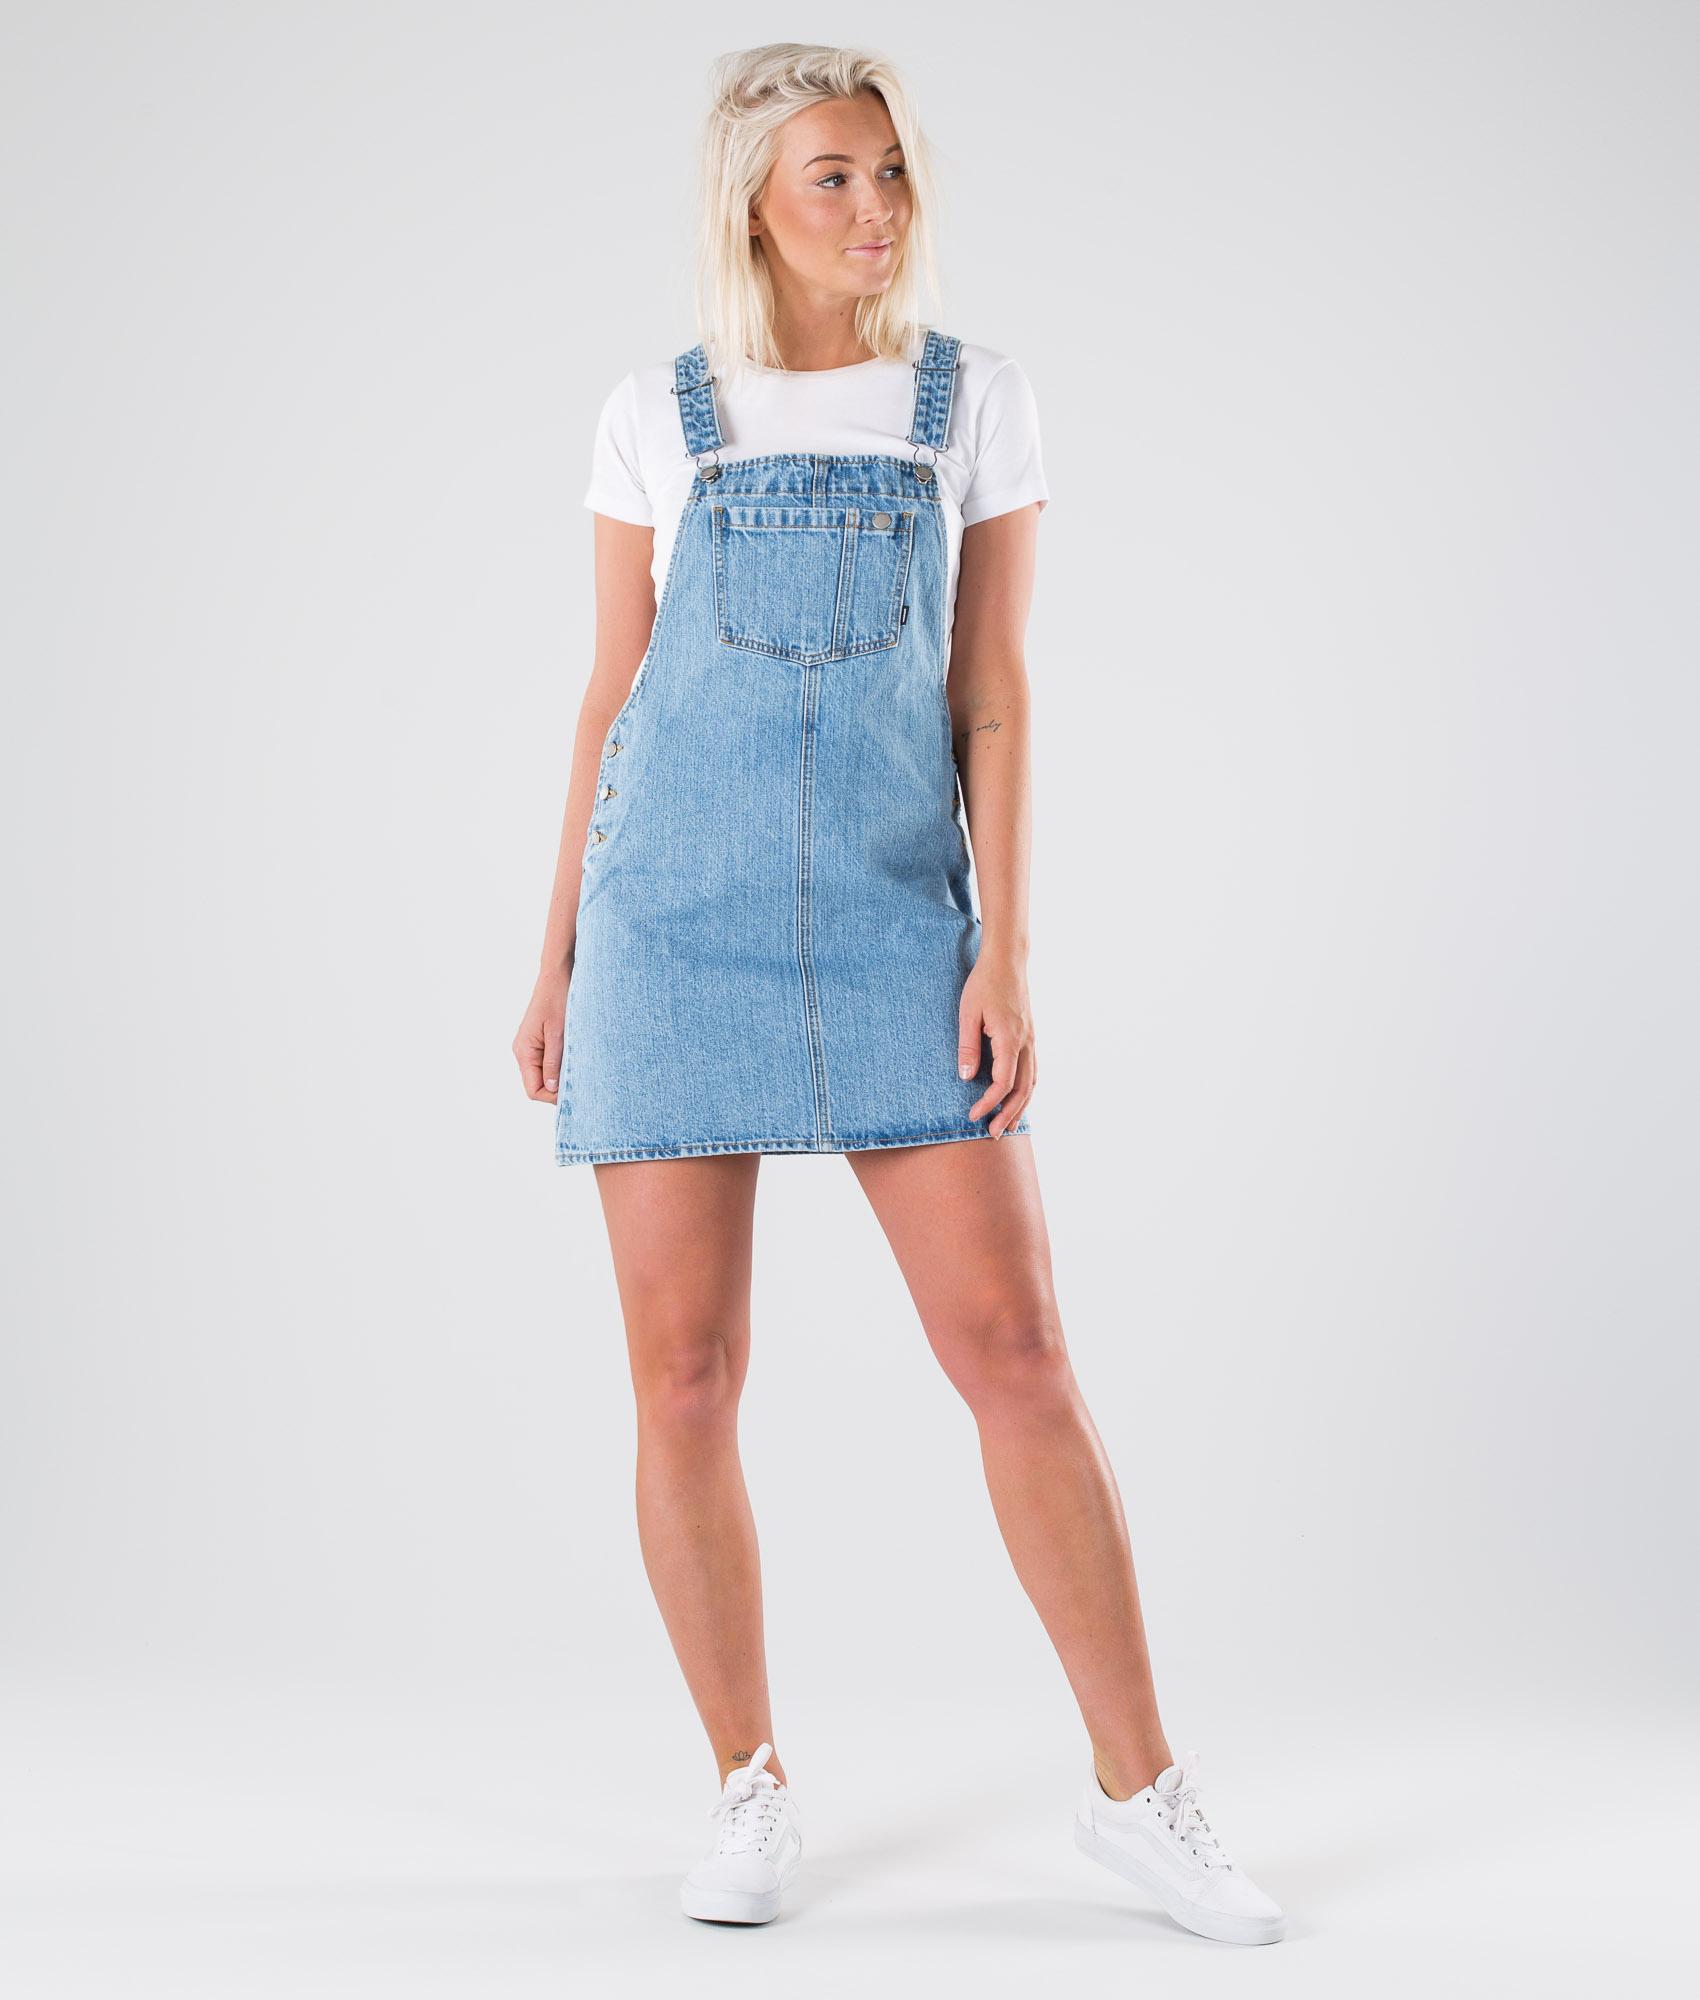 0638f4f4c2e4 Dr Denim Eir Dungaree Dress Vestito Summer Camp Blue - Ridestore.it